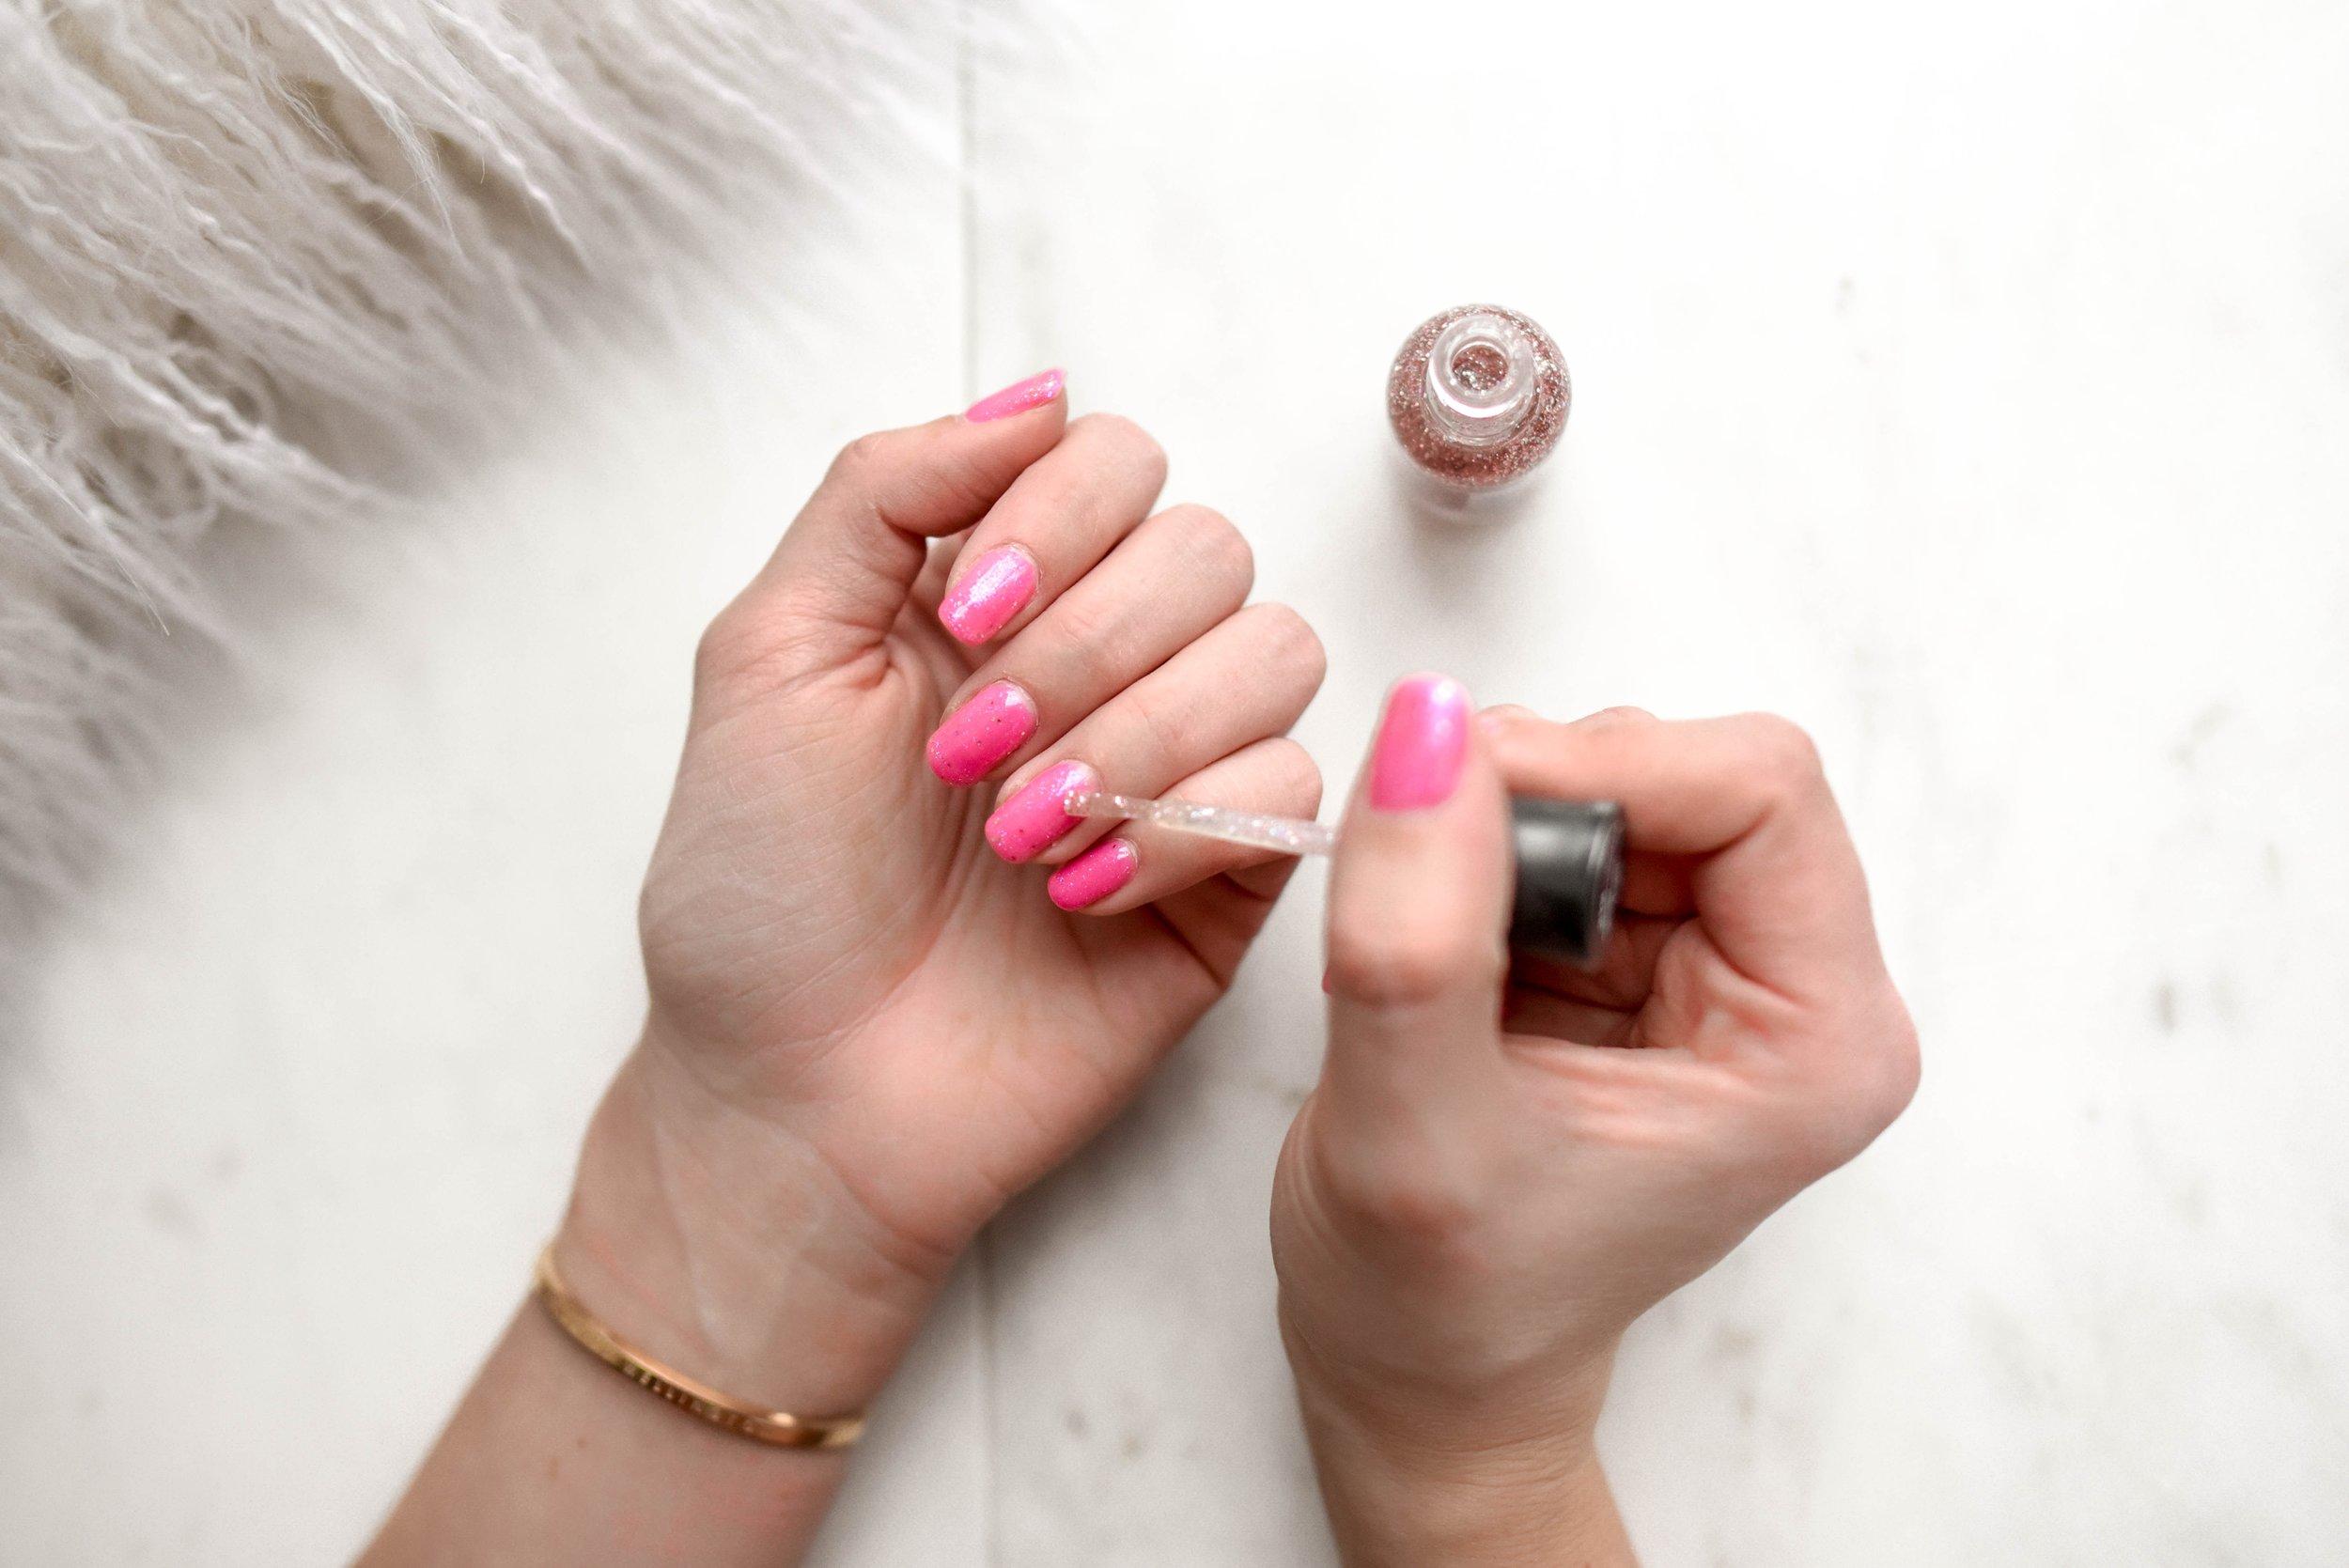 DIY Nail Care. 50 Ways to Have a DIY Spa Day at Home